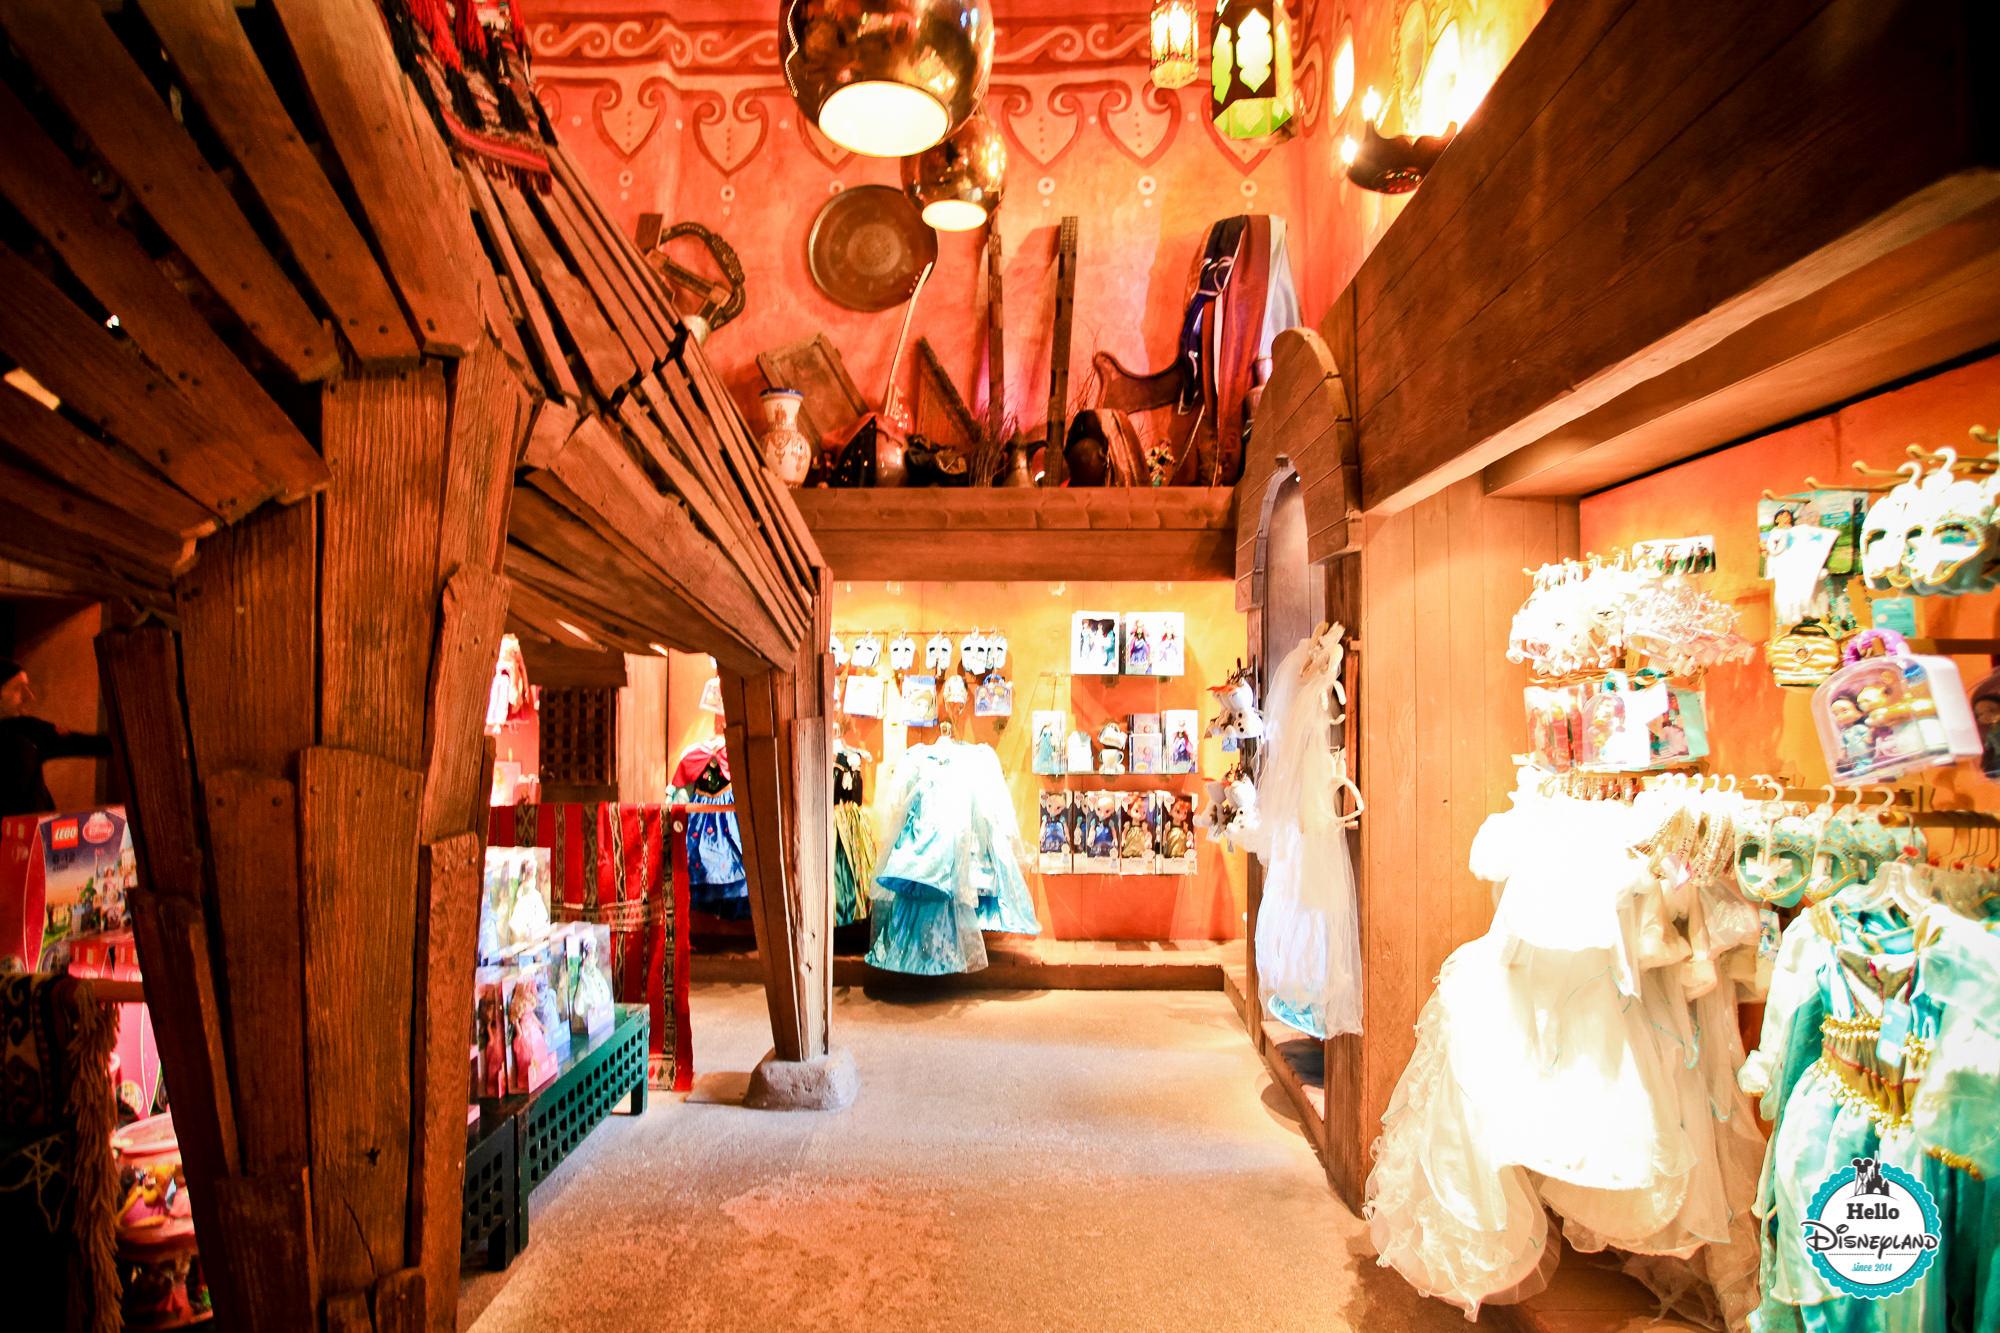 Hello Disneyland Le Blog N 1 Sur Disneyland Paris Preparer Un